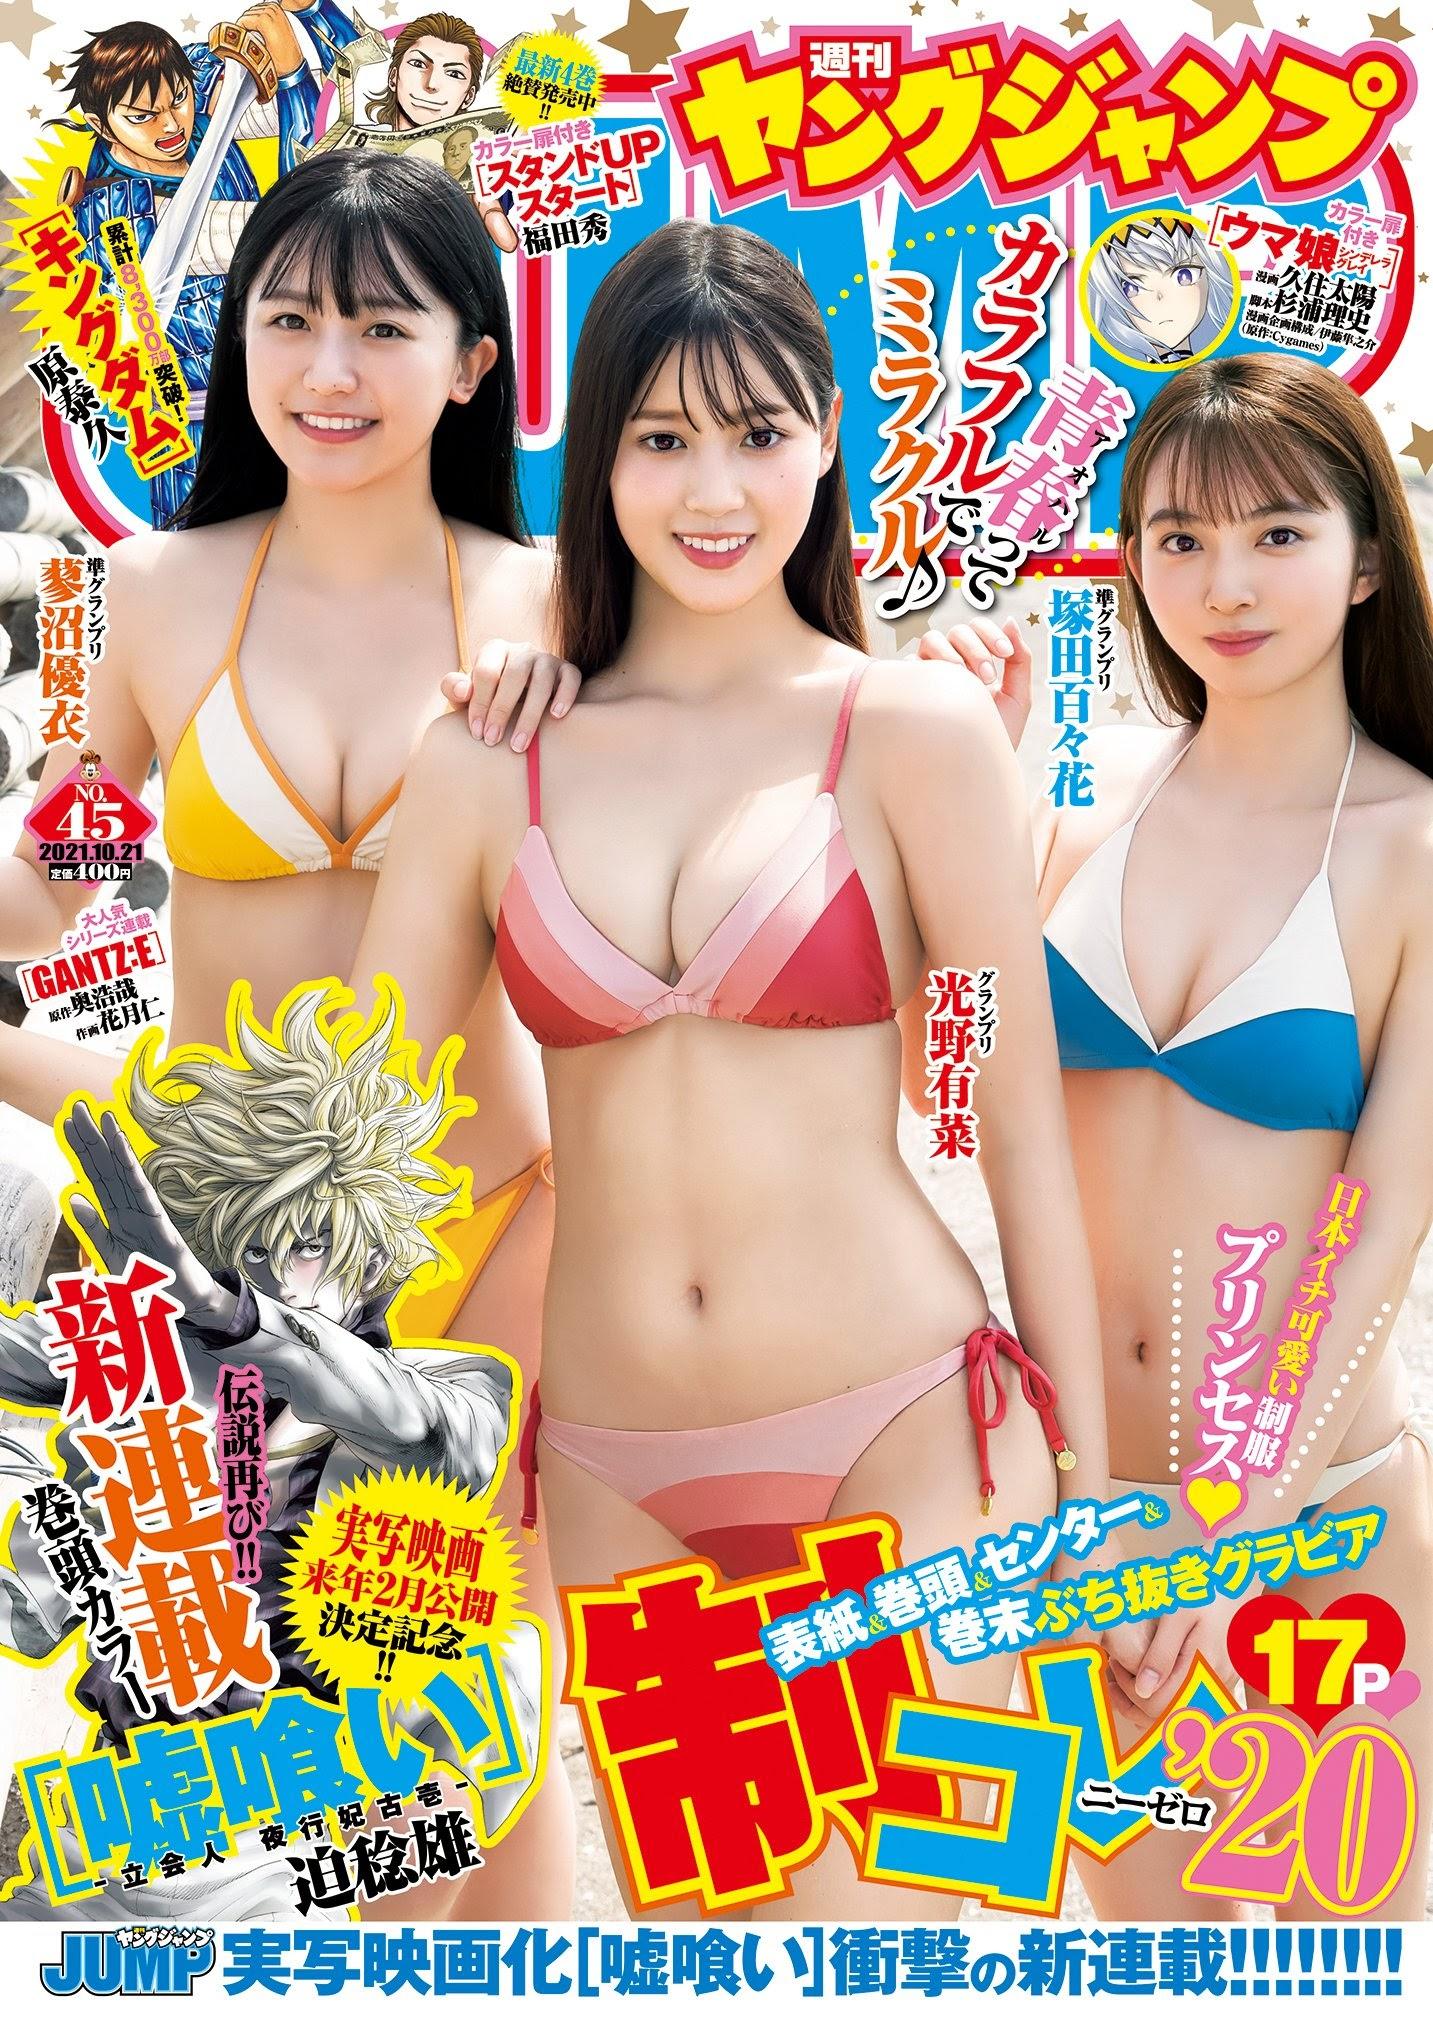 光野有菜 蓼沼優衣 塚田百々花 最上もが-YOUNG JUMP 2021.10.21 NO.4